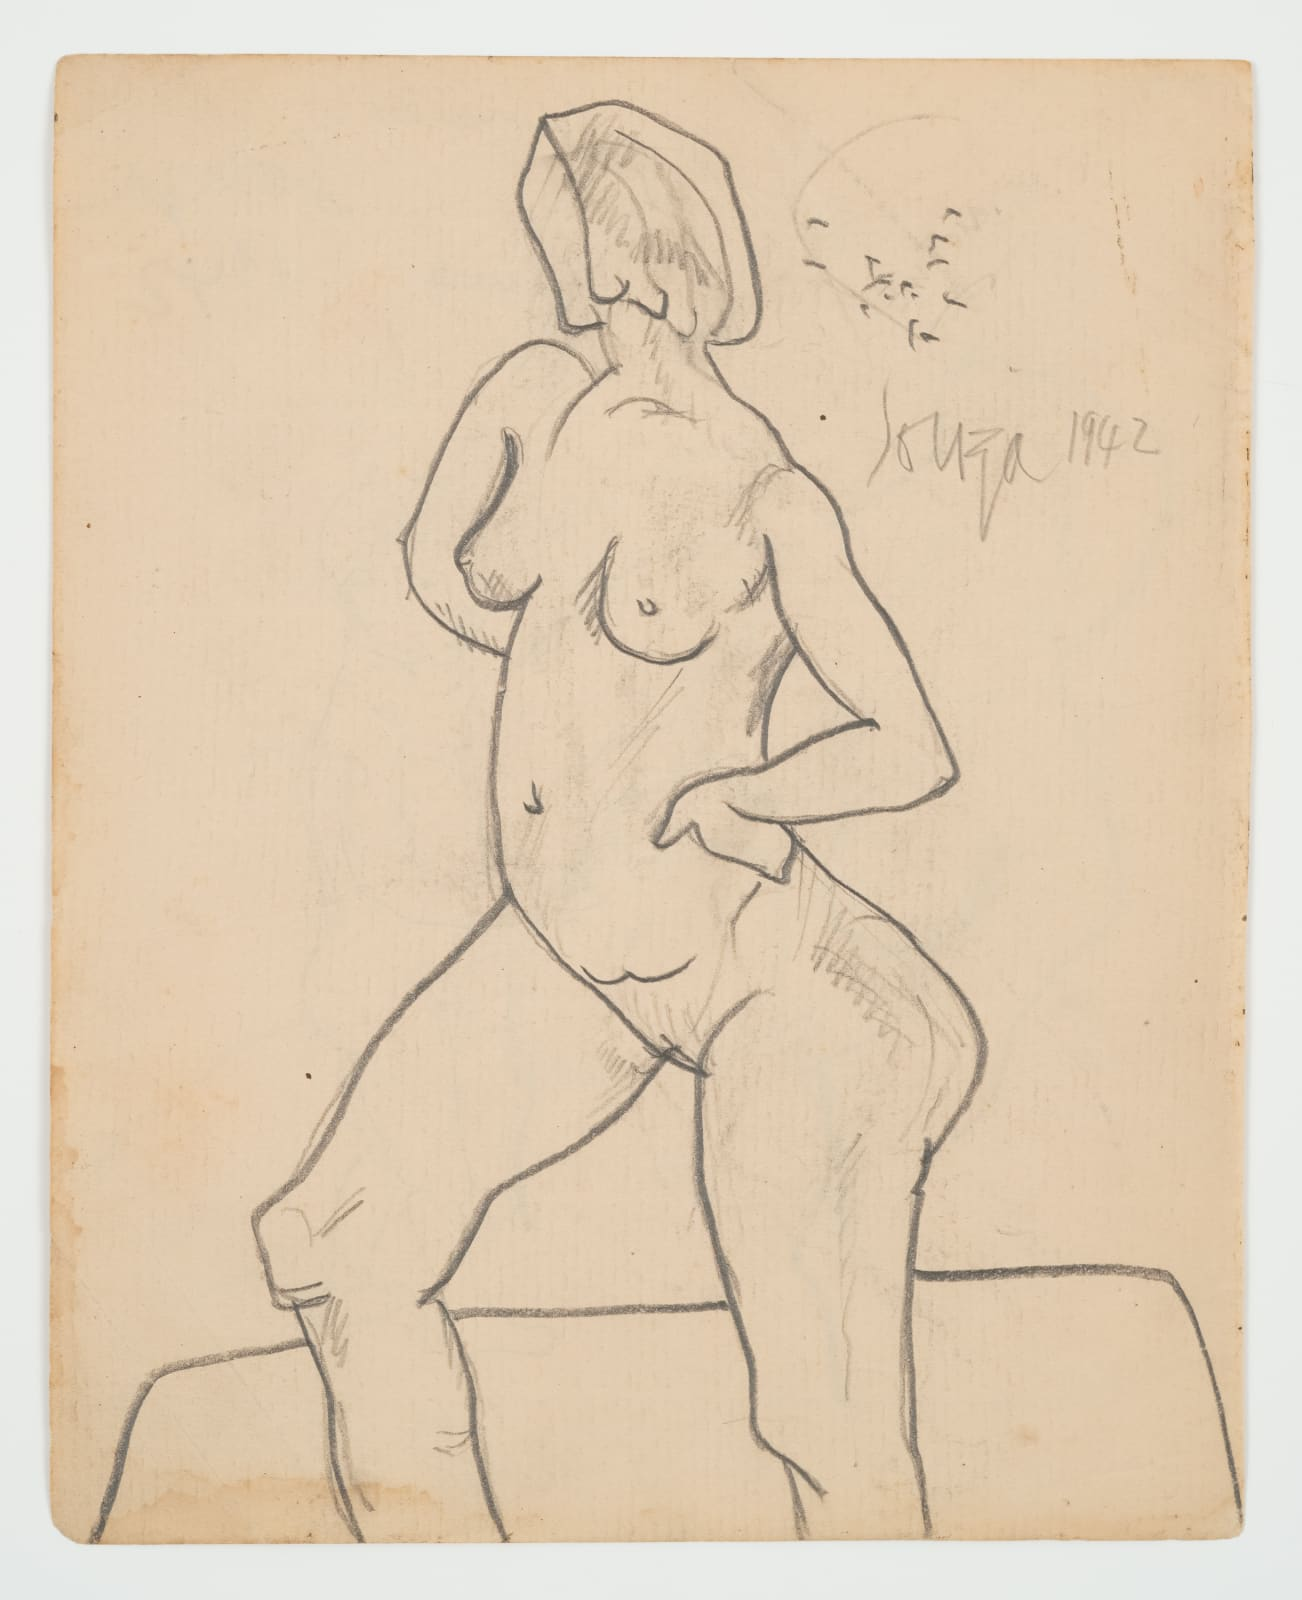 Francis Newton Souza, Untitled - (Figure Study), 1942